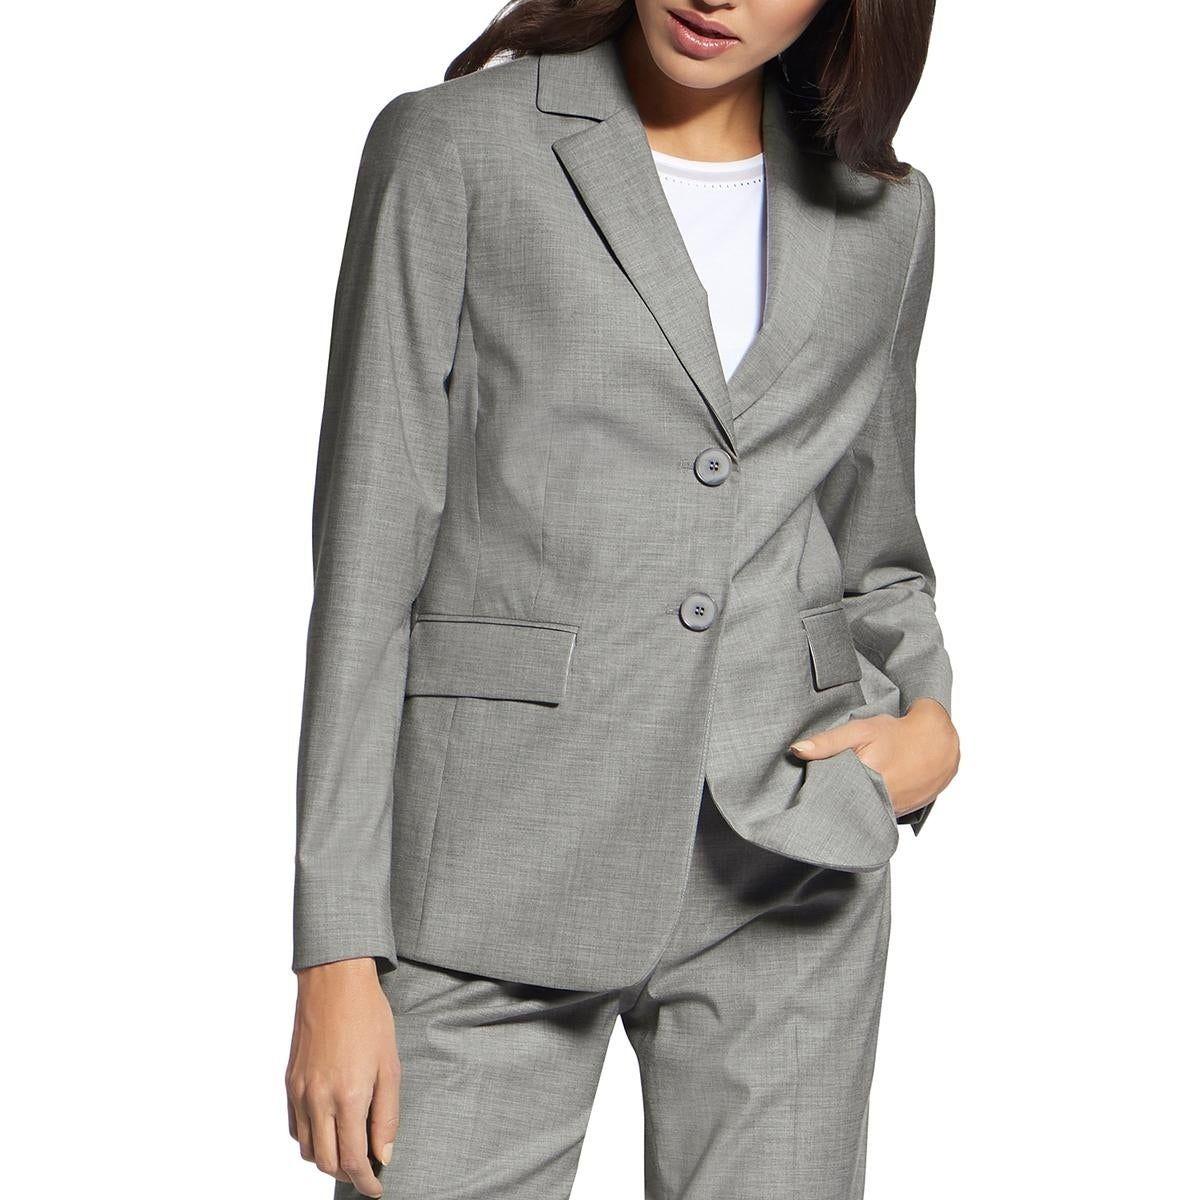 Grey Suit Jacket